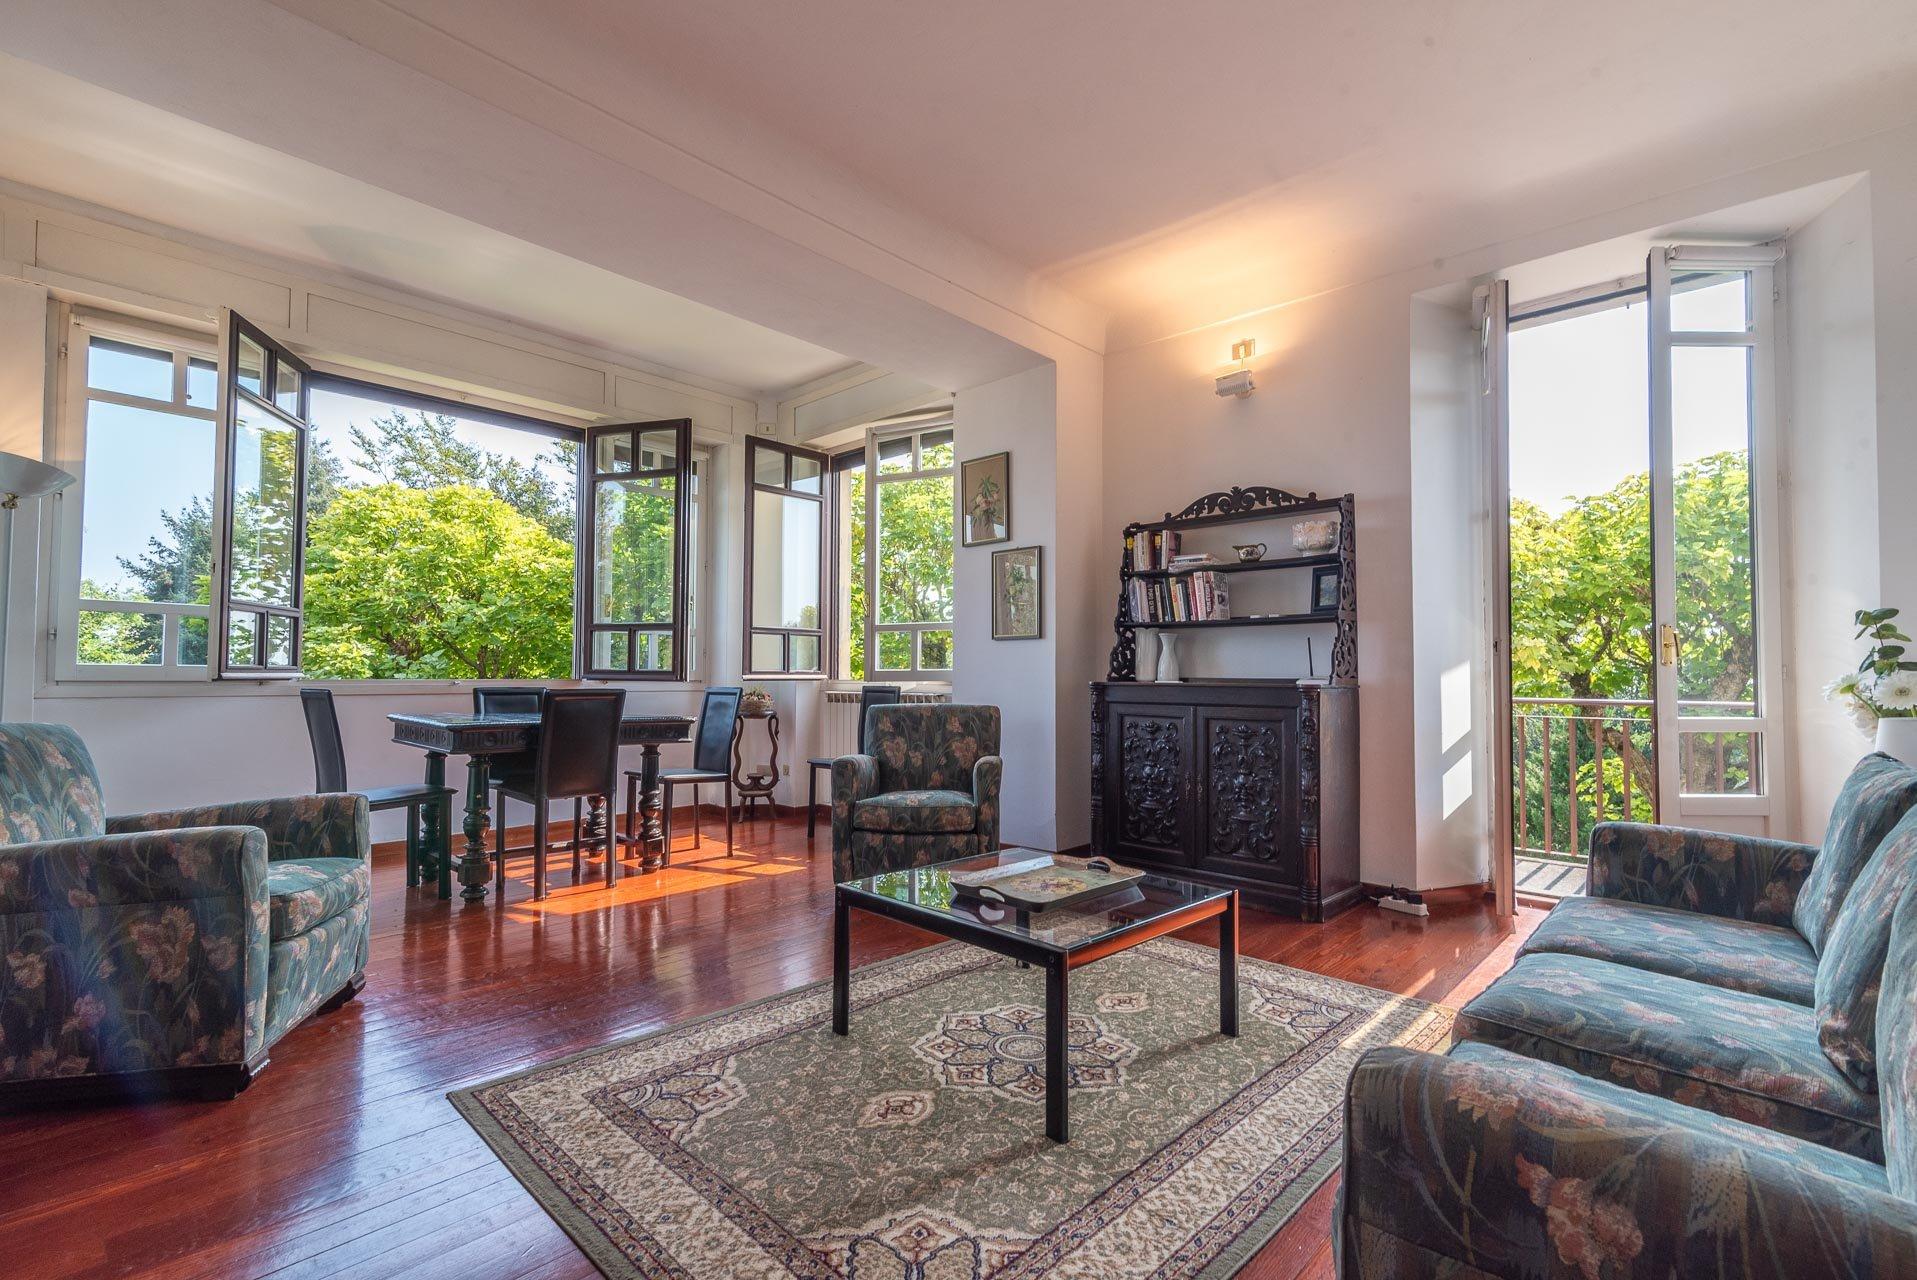 Rental Apartment - Gignese Alpino - Italy